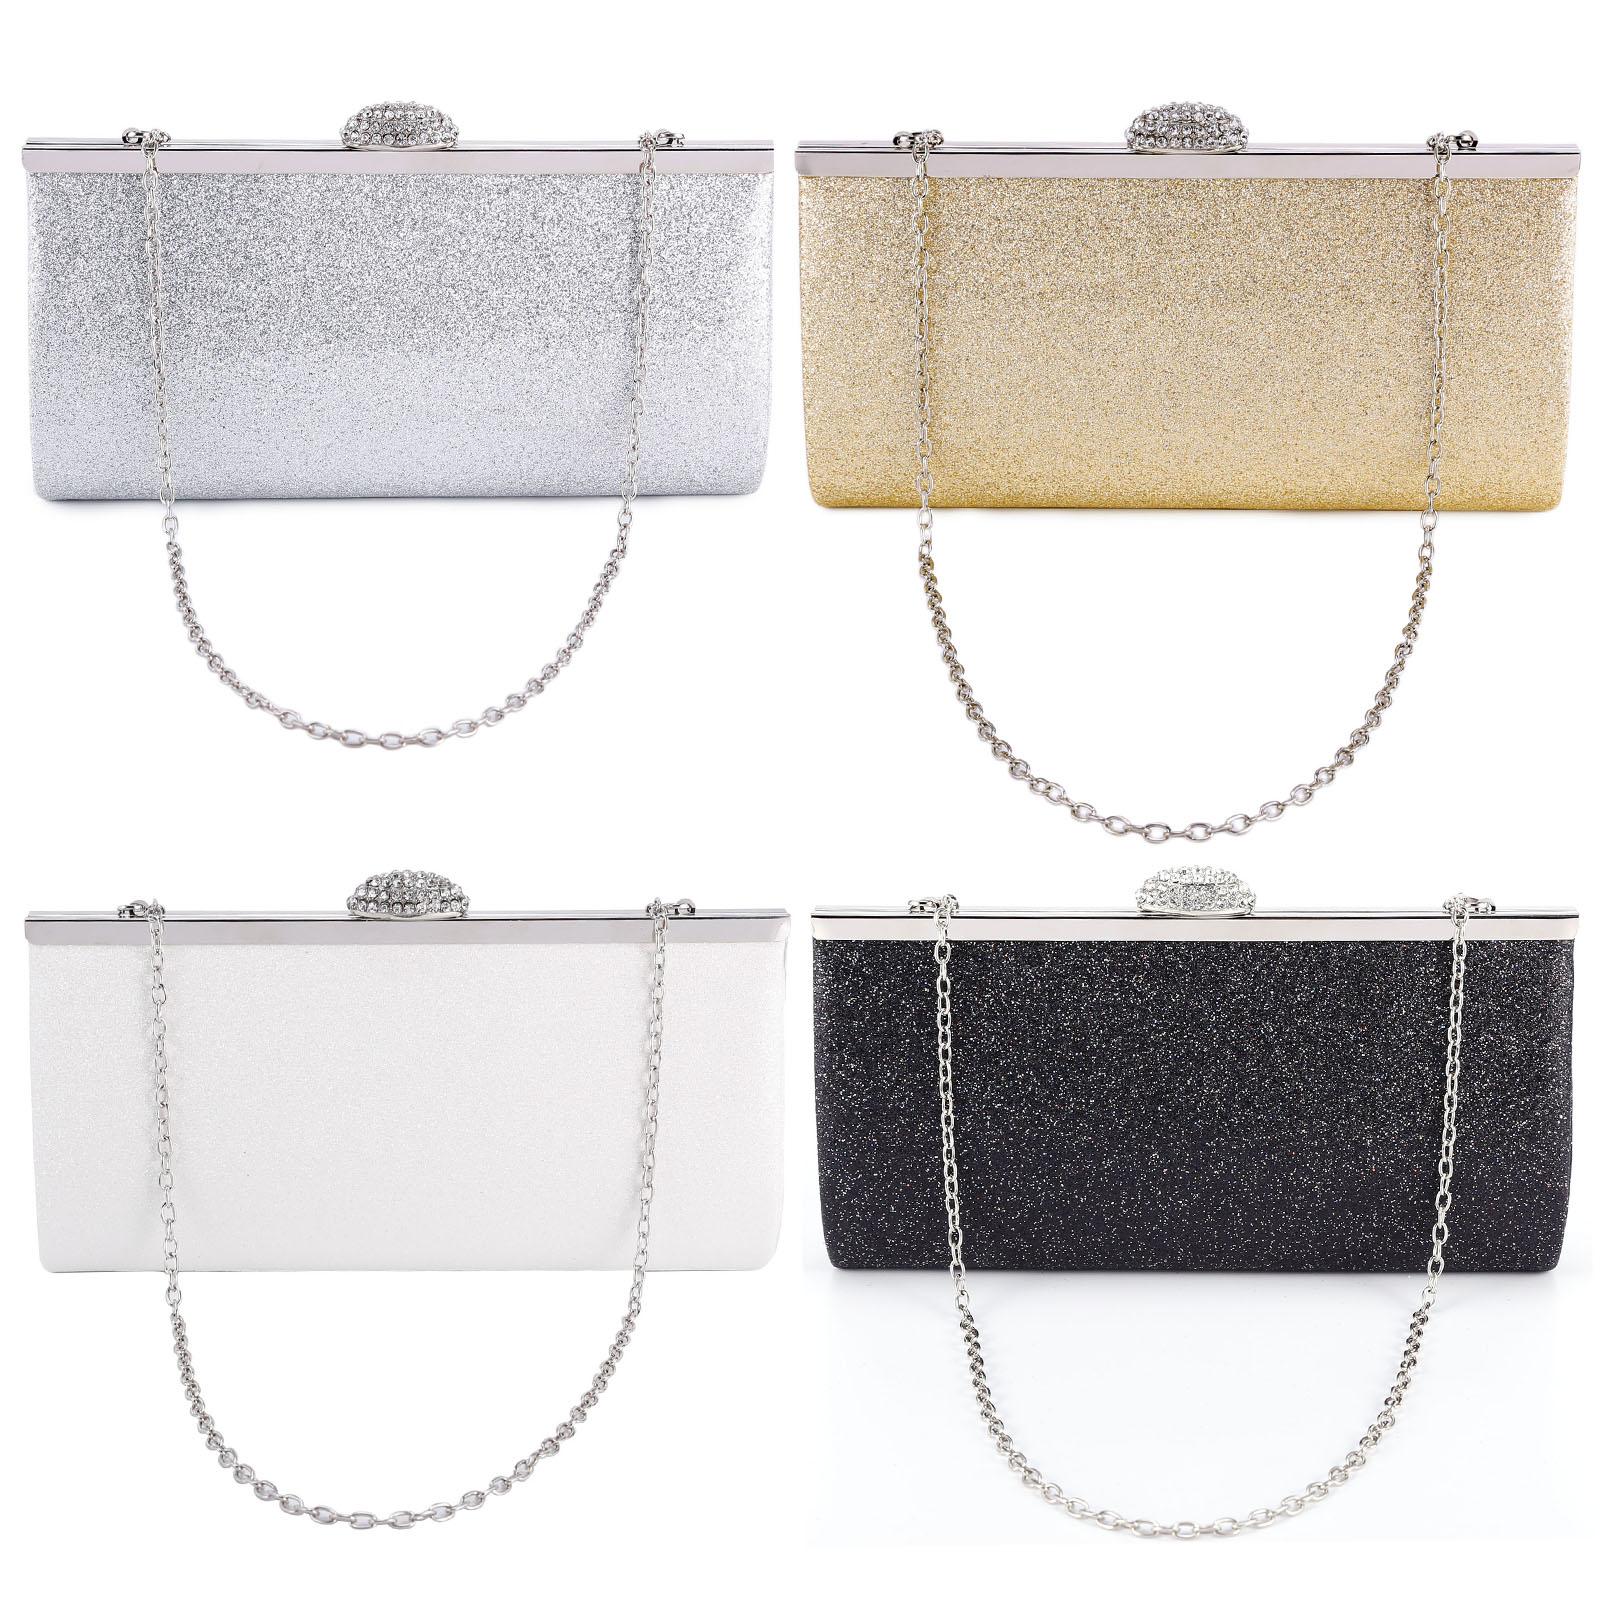 d7a1ff427f Details about Ladies Evening Bag Clutch Purse Bridal Prom Party Rhinestone  Bag Bride Handbag